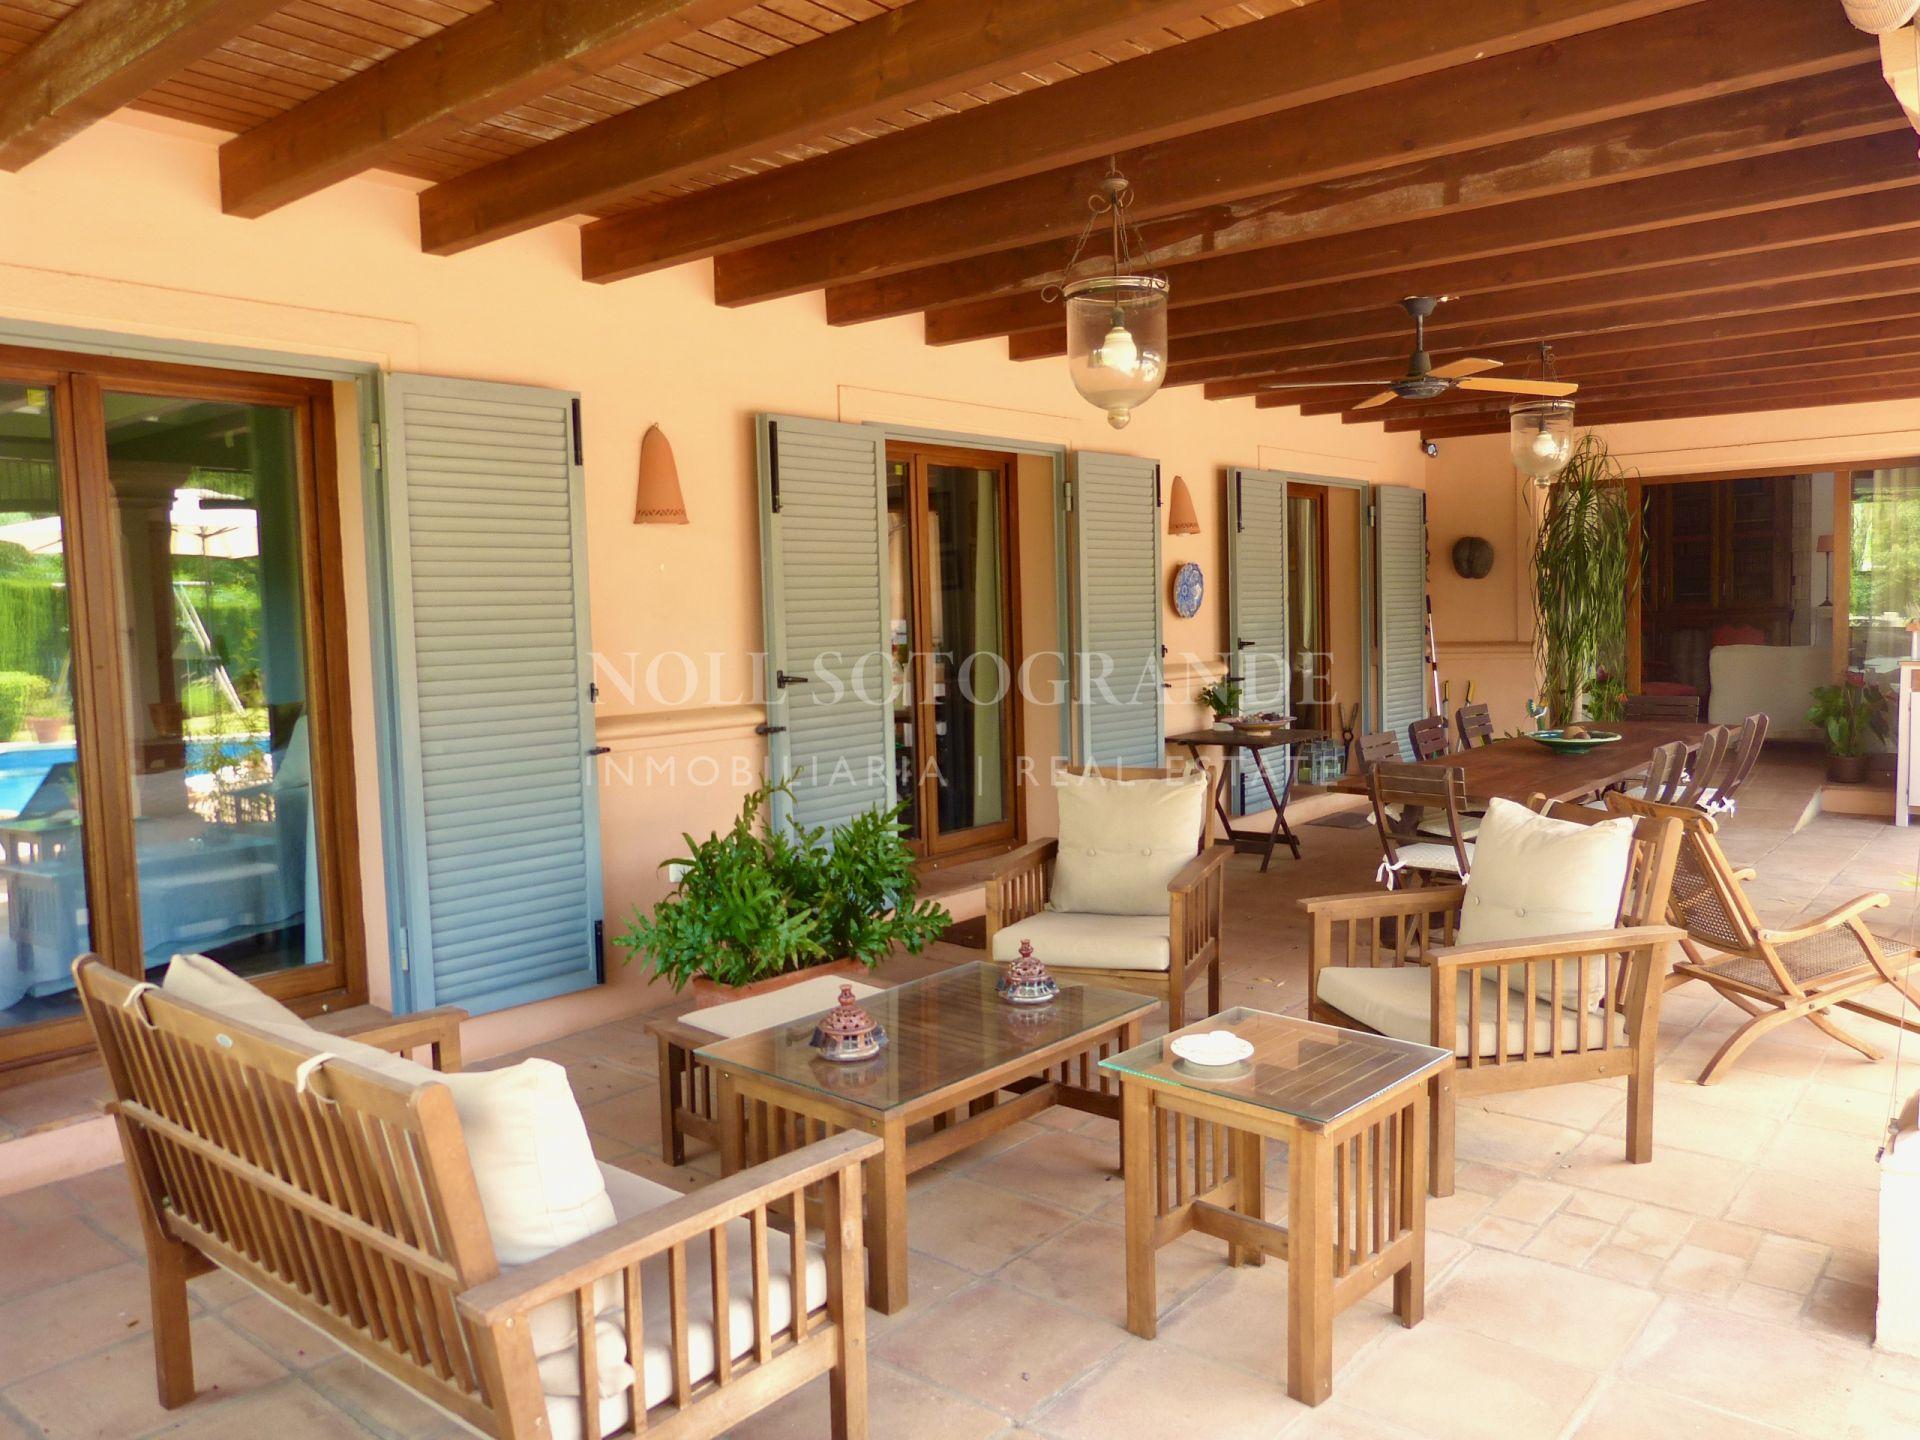 Charming Bungalow a la Provence for sale in Sotogrande Alto